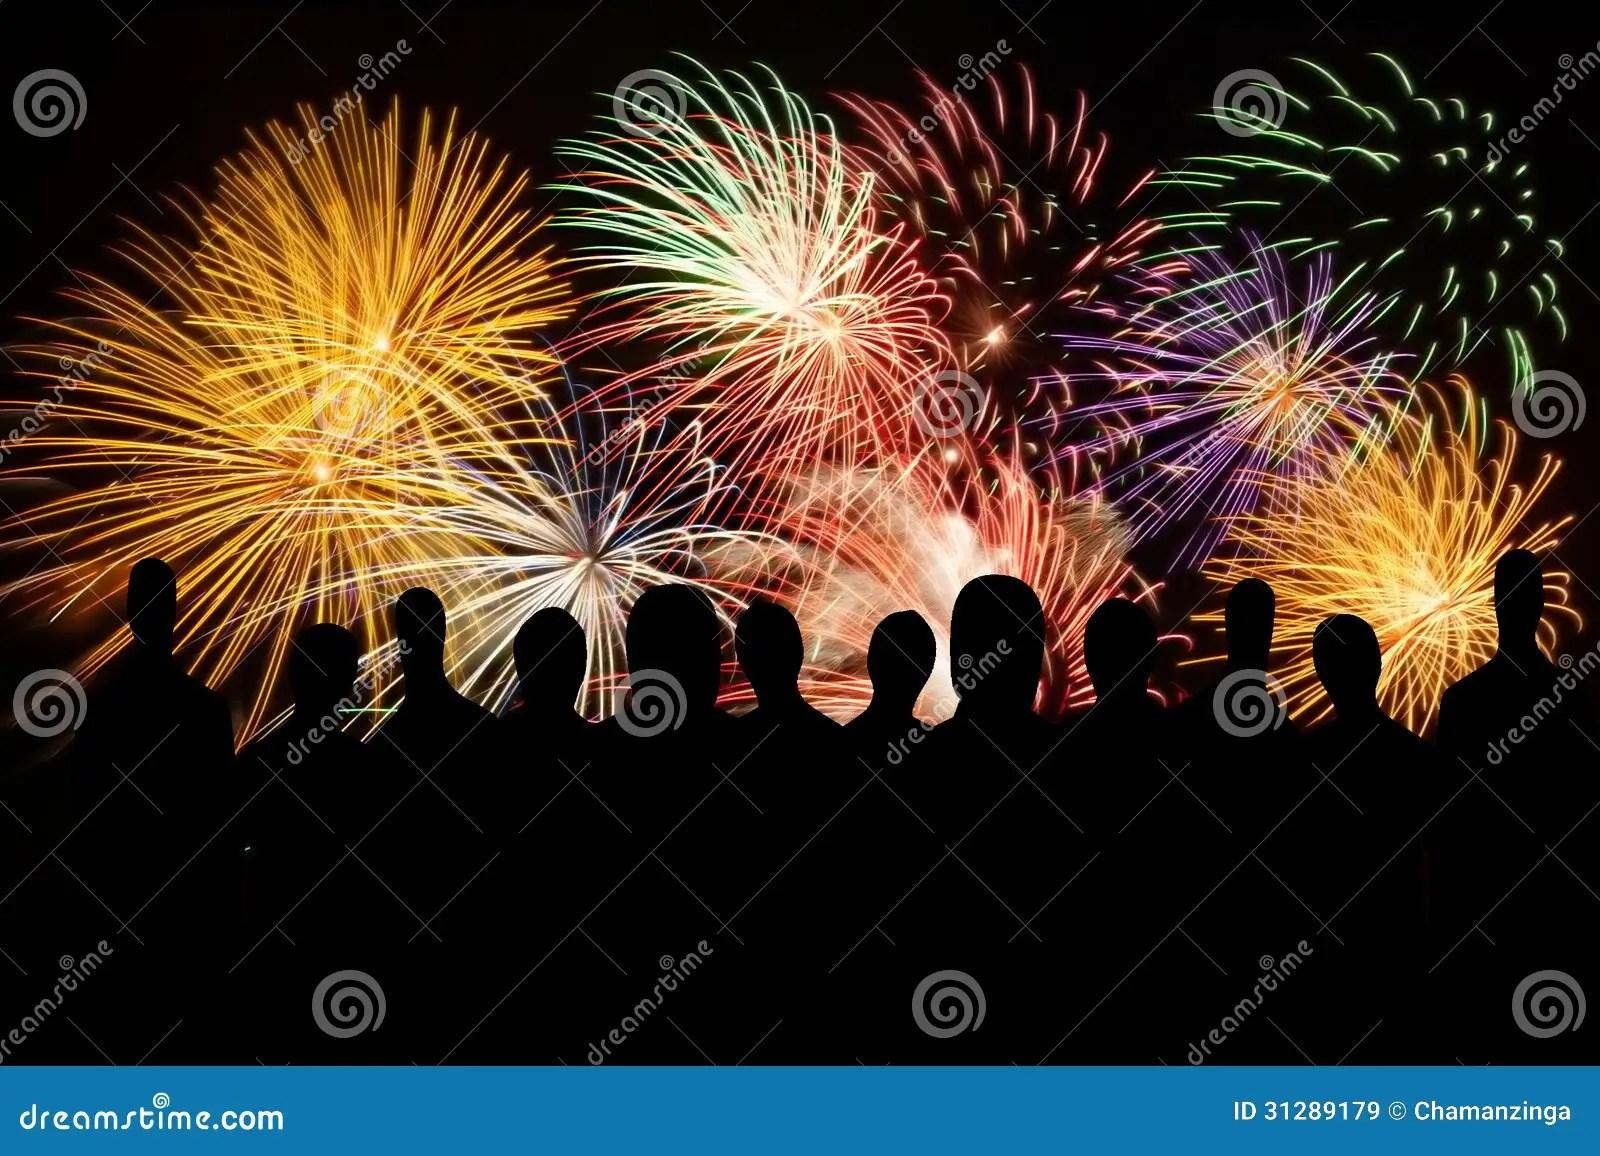 City Silhouette Fireworks